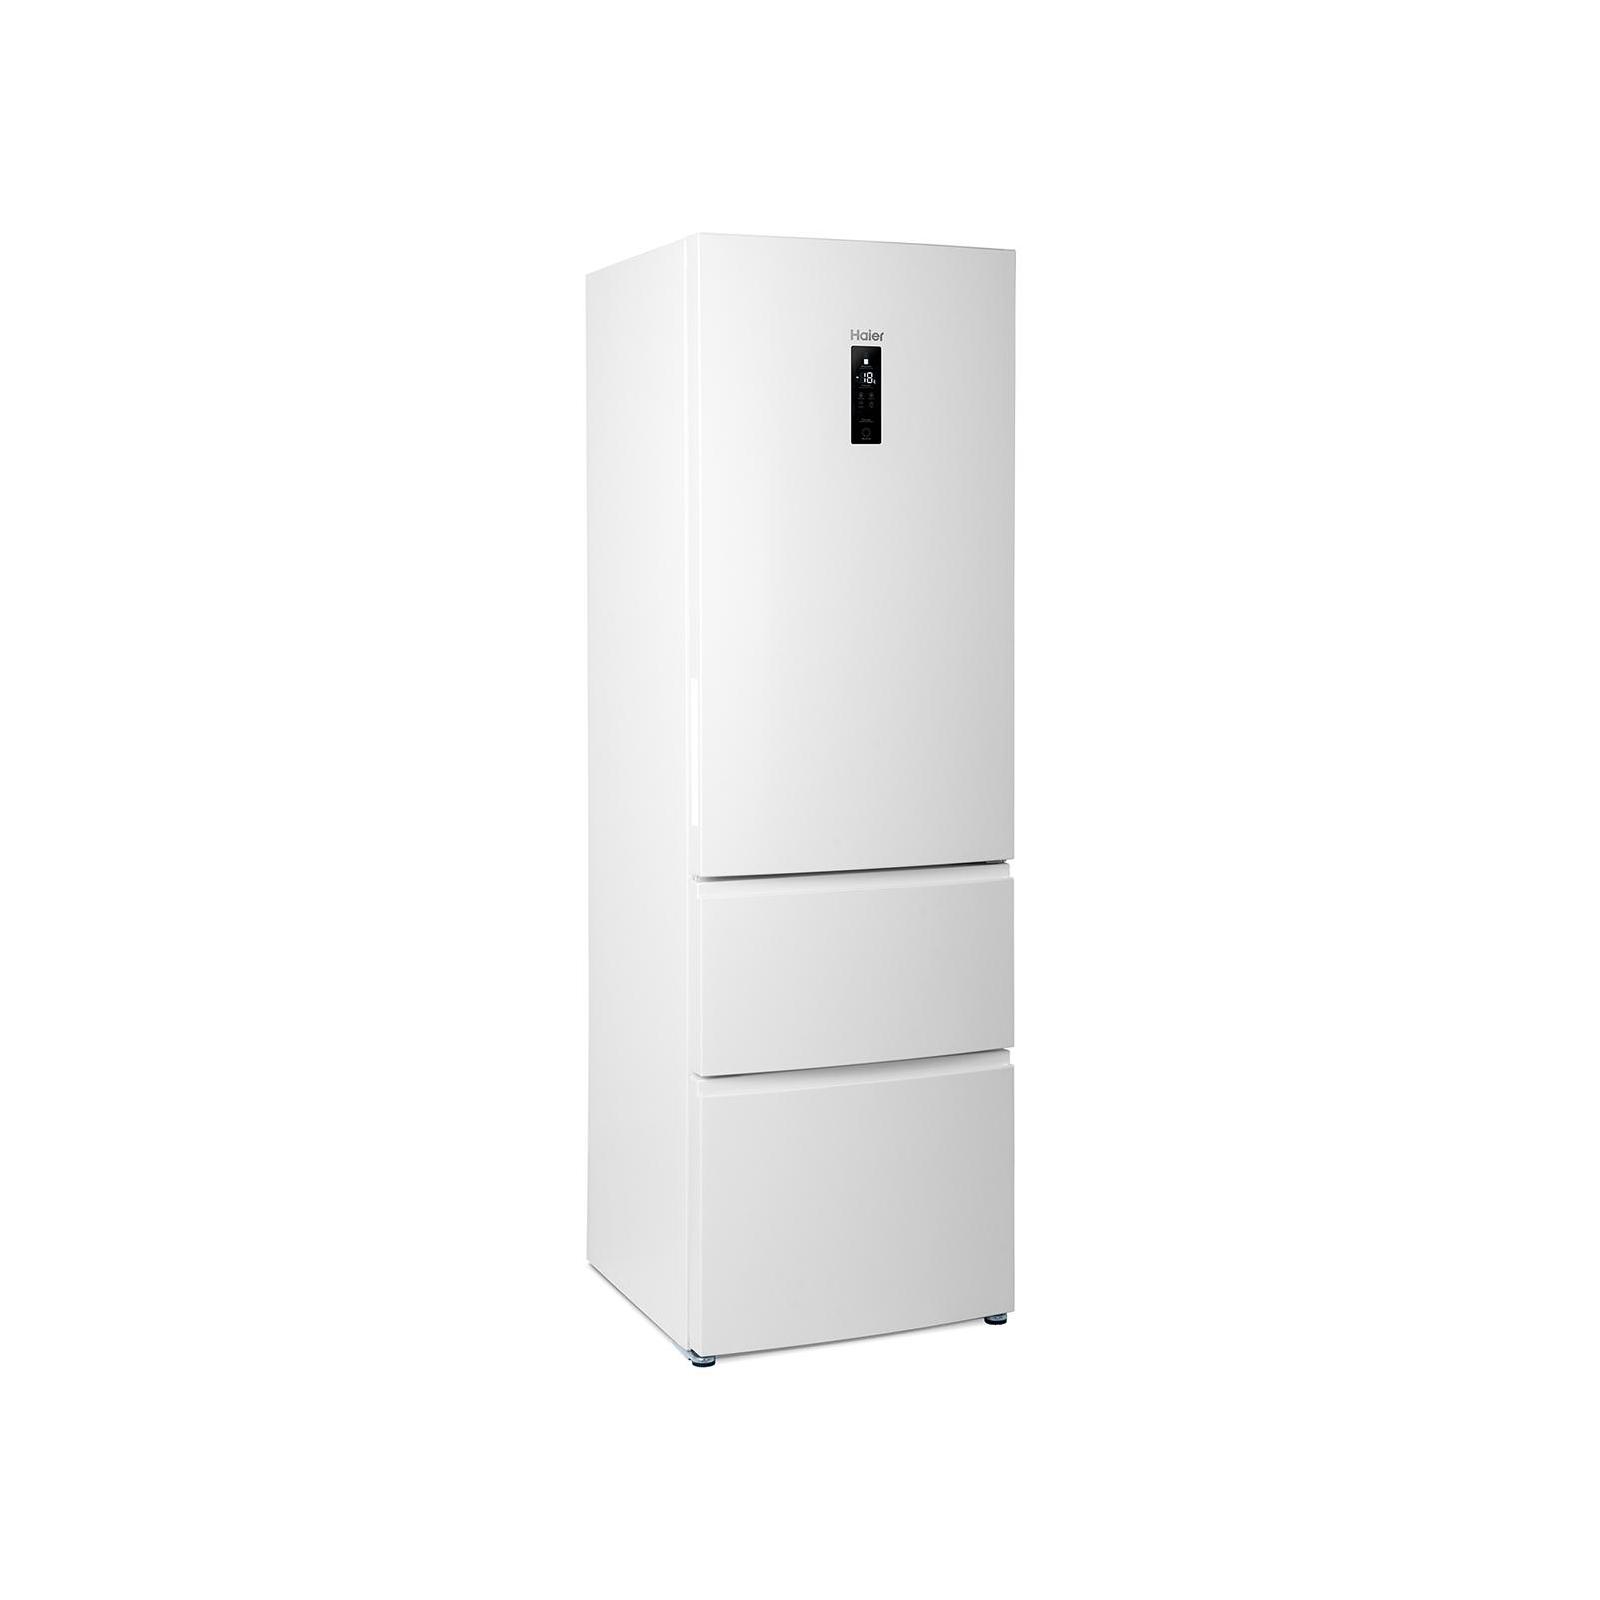 Холодильник Haier HA A2F635CWMV изображение 2